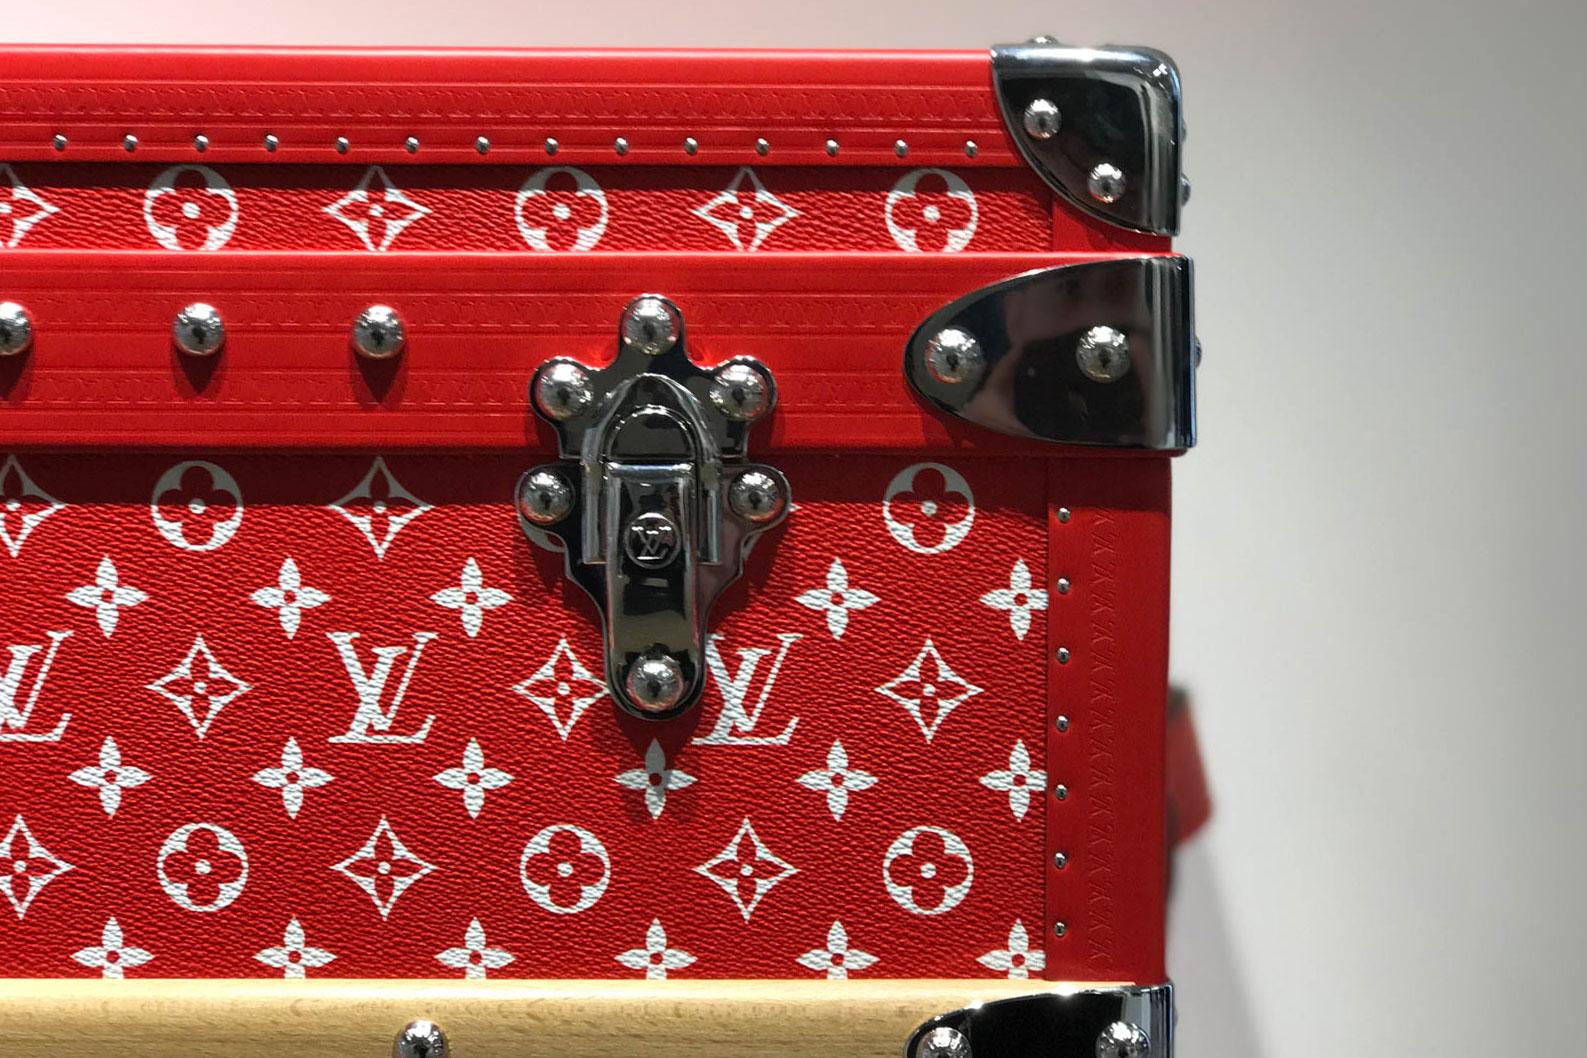 Supreme x Louis Vuitton 2017 Fall/Winter Closer Look Showroom - 3703527